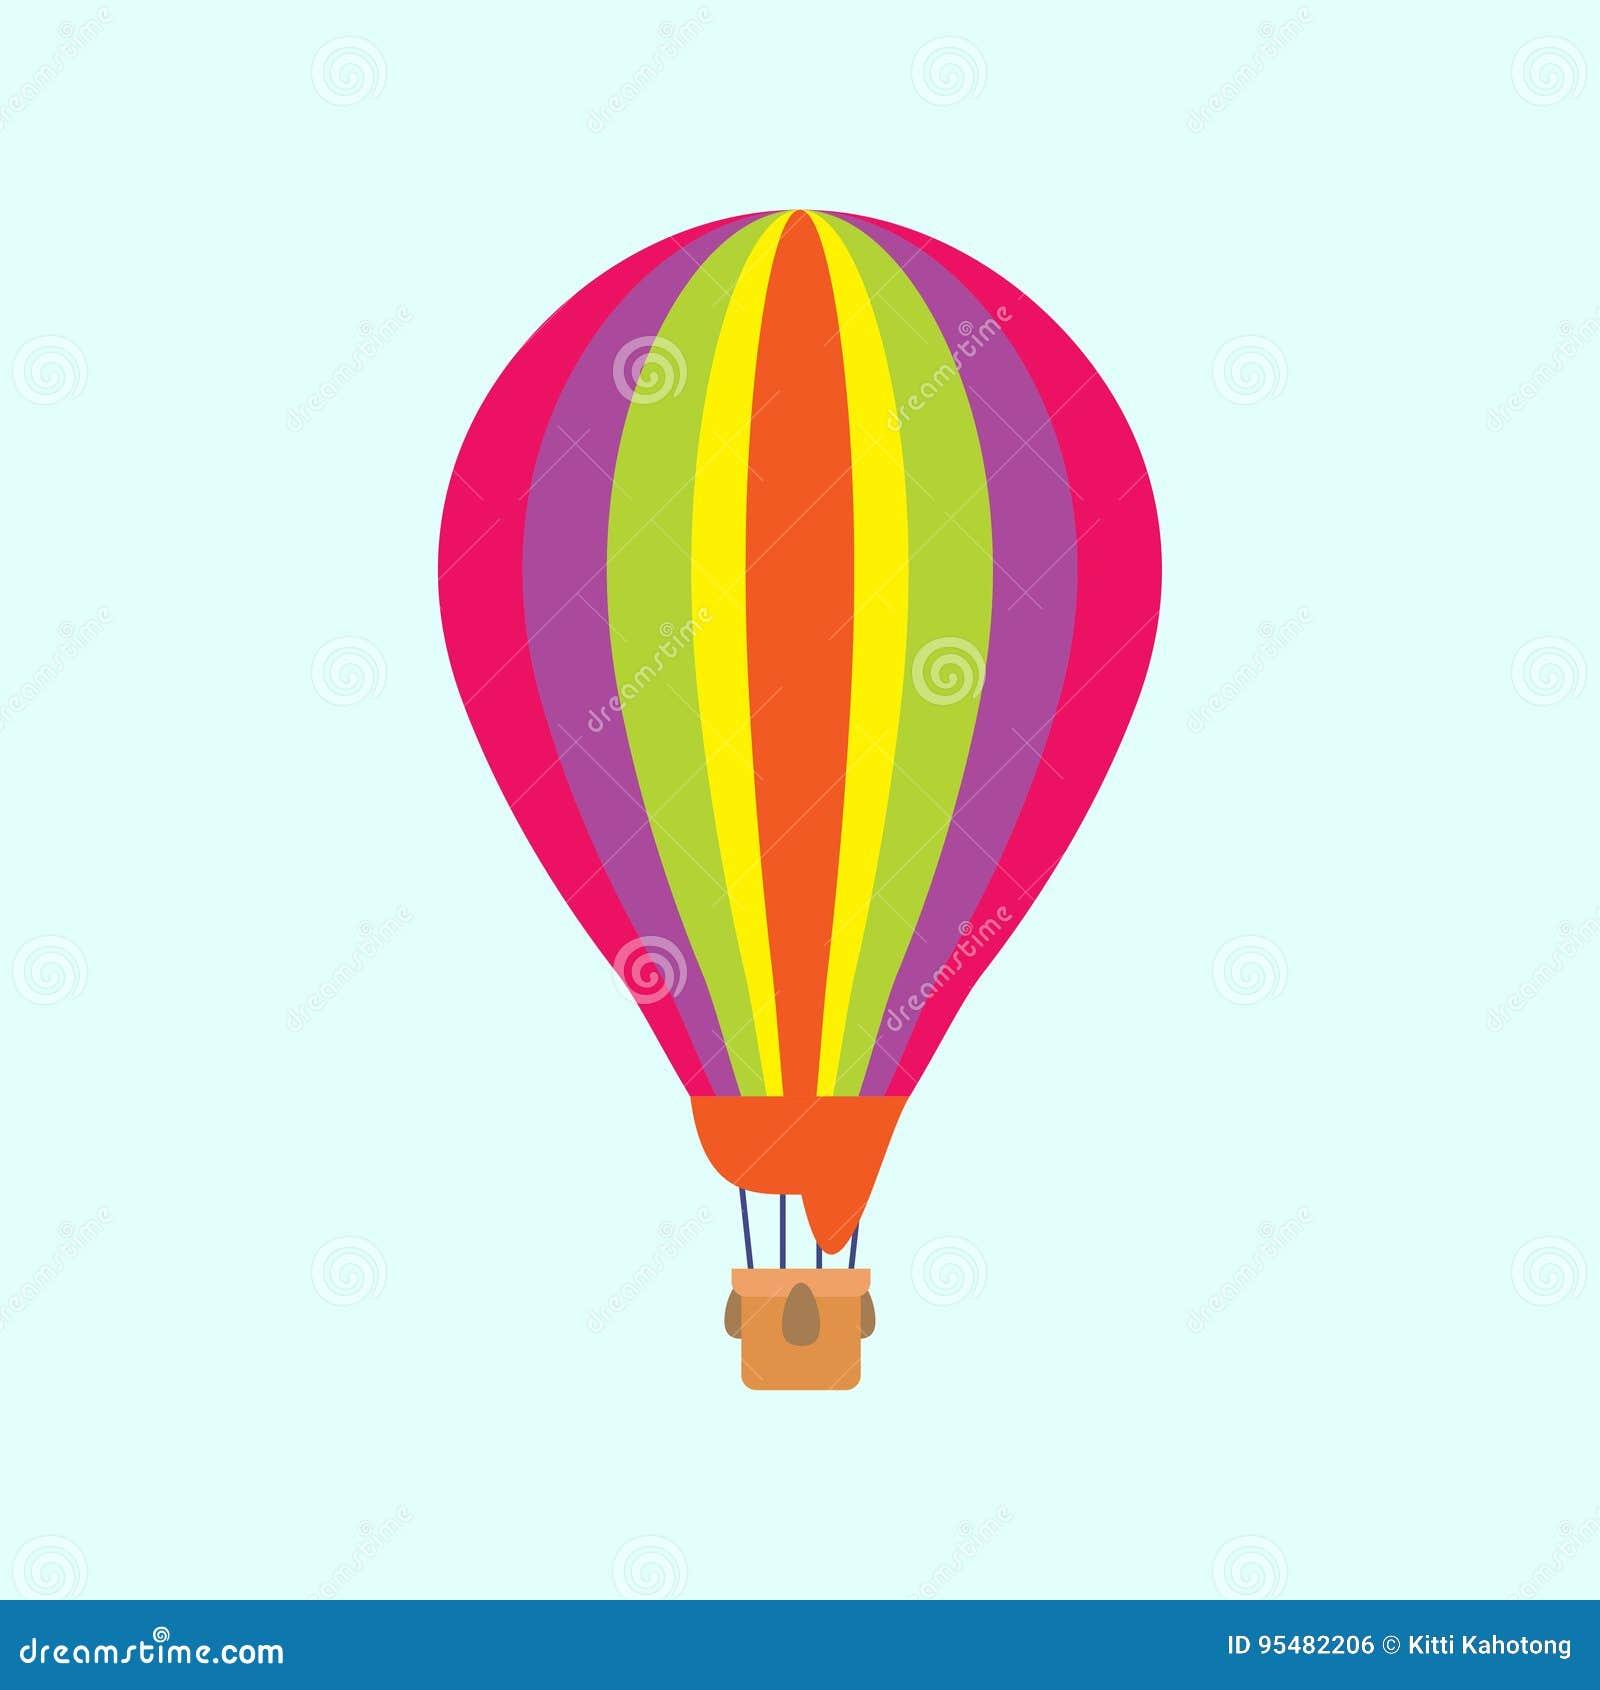 Balon na nieba tle lub błękitnym tle